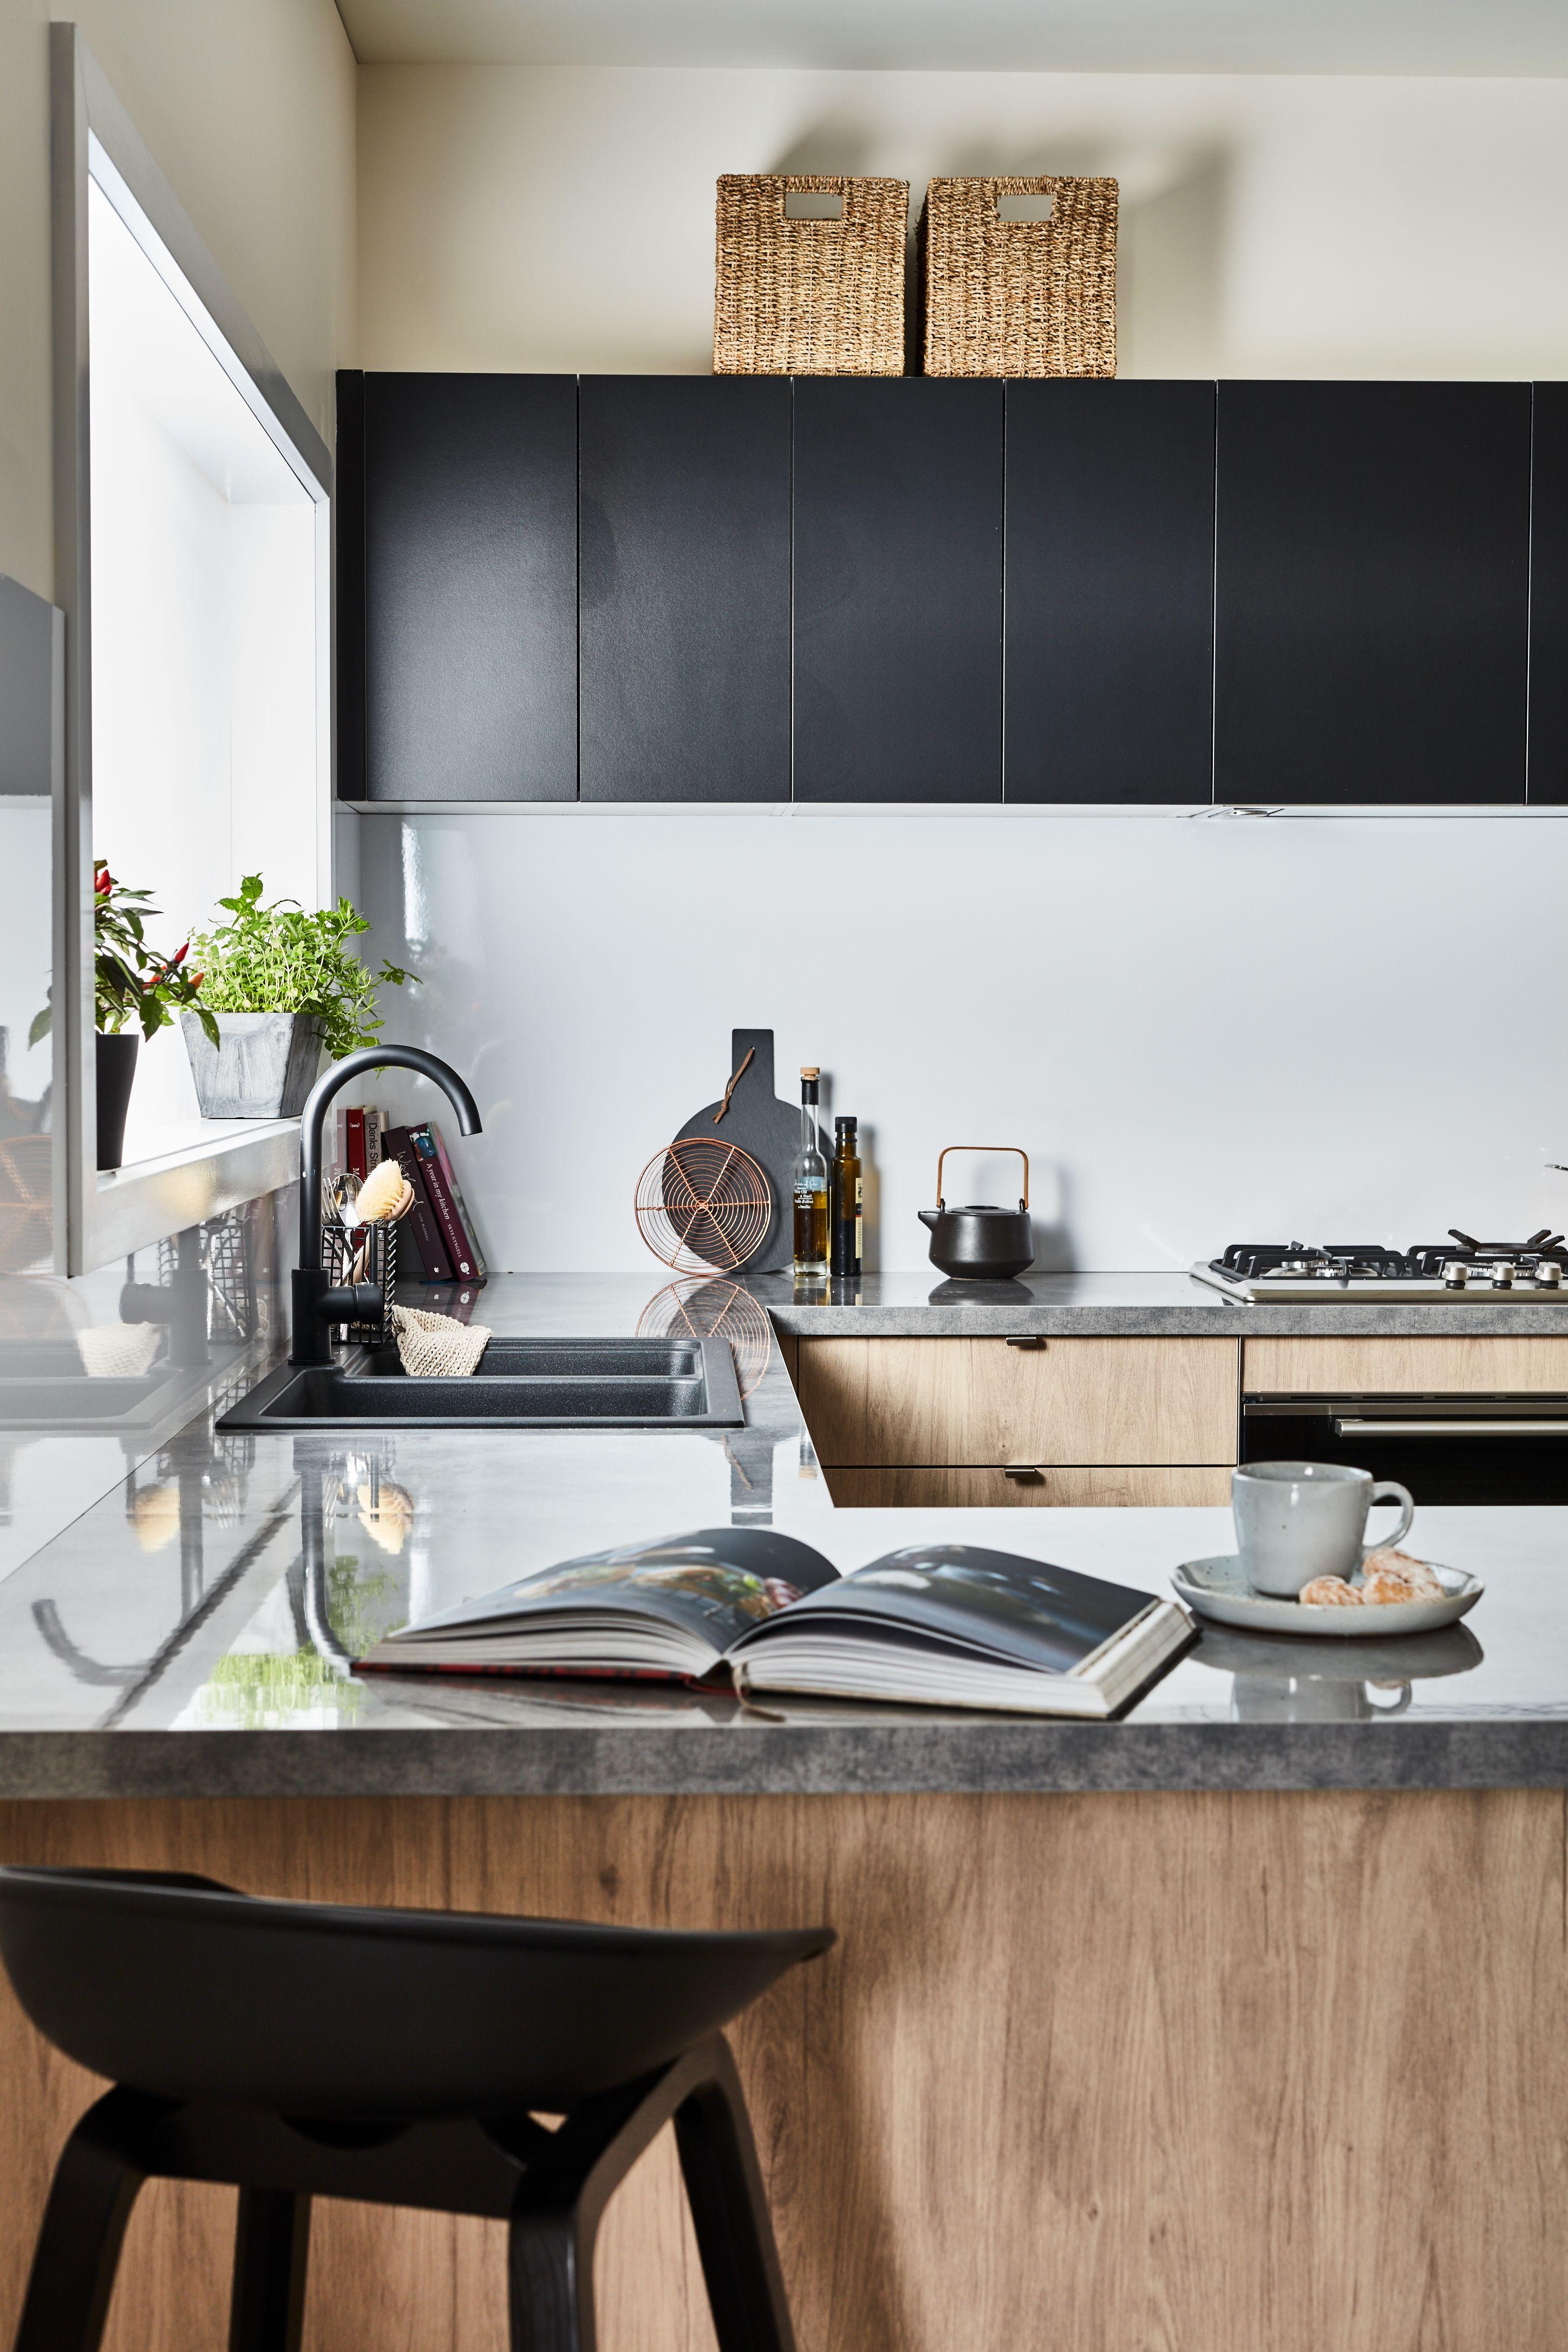 Industrial Kitchen Design Bunnings Kaboodlekitchen Kitchen Kitchen Cabinets For Sale Industrial Style Kitchen Kitchen Renovation